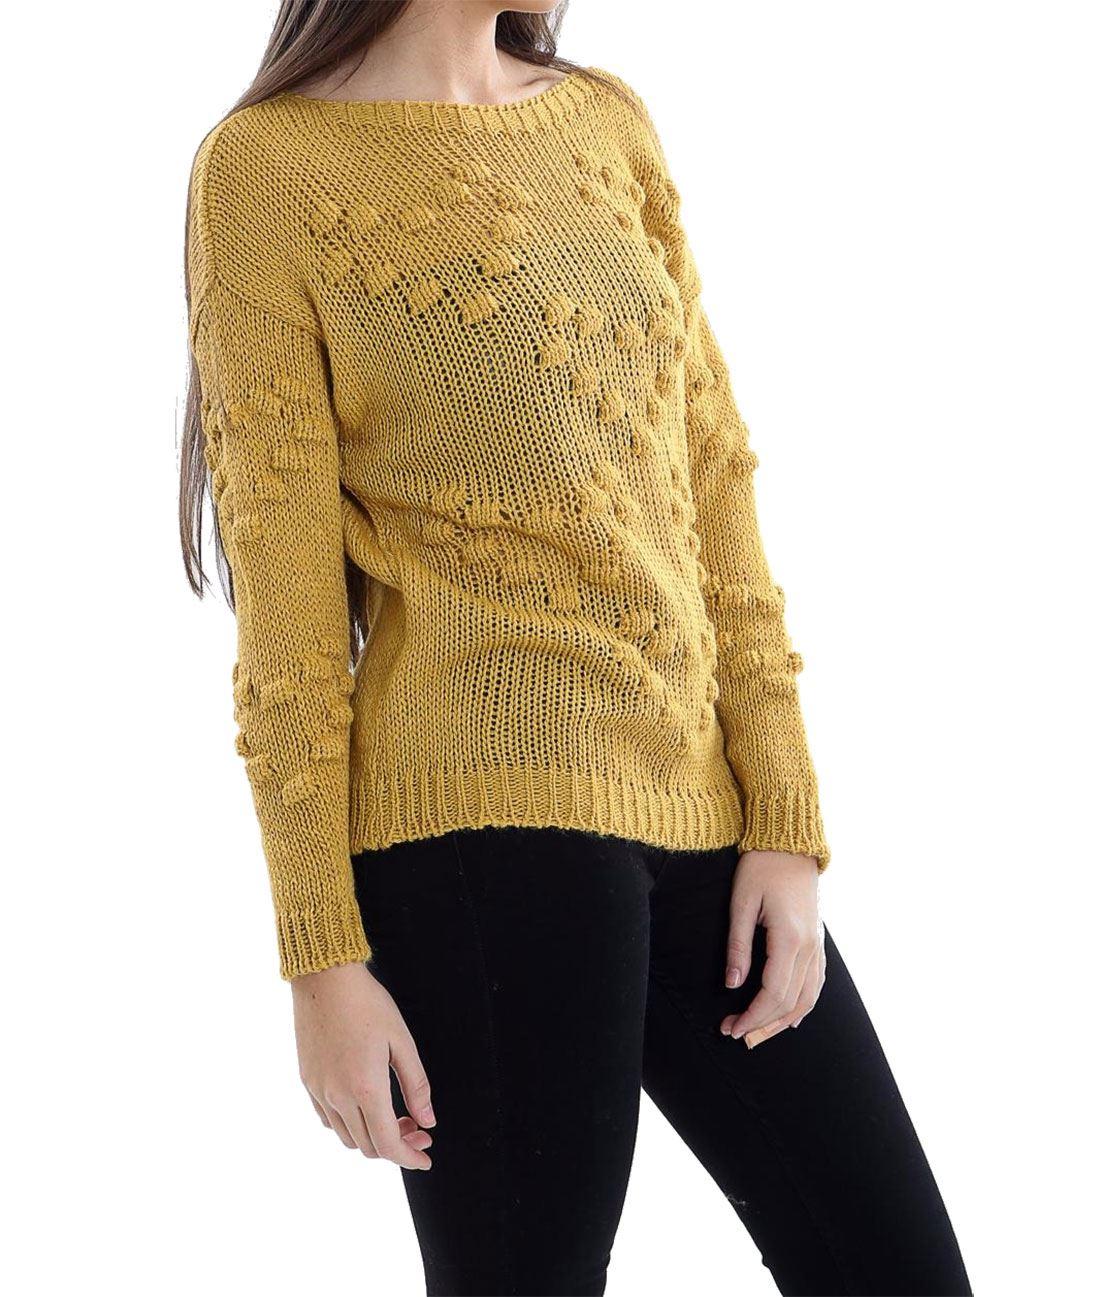 748a542169d Ladies Fancy Bobble Pattern Knitted Heart Jumper Womens Winter Party ...